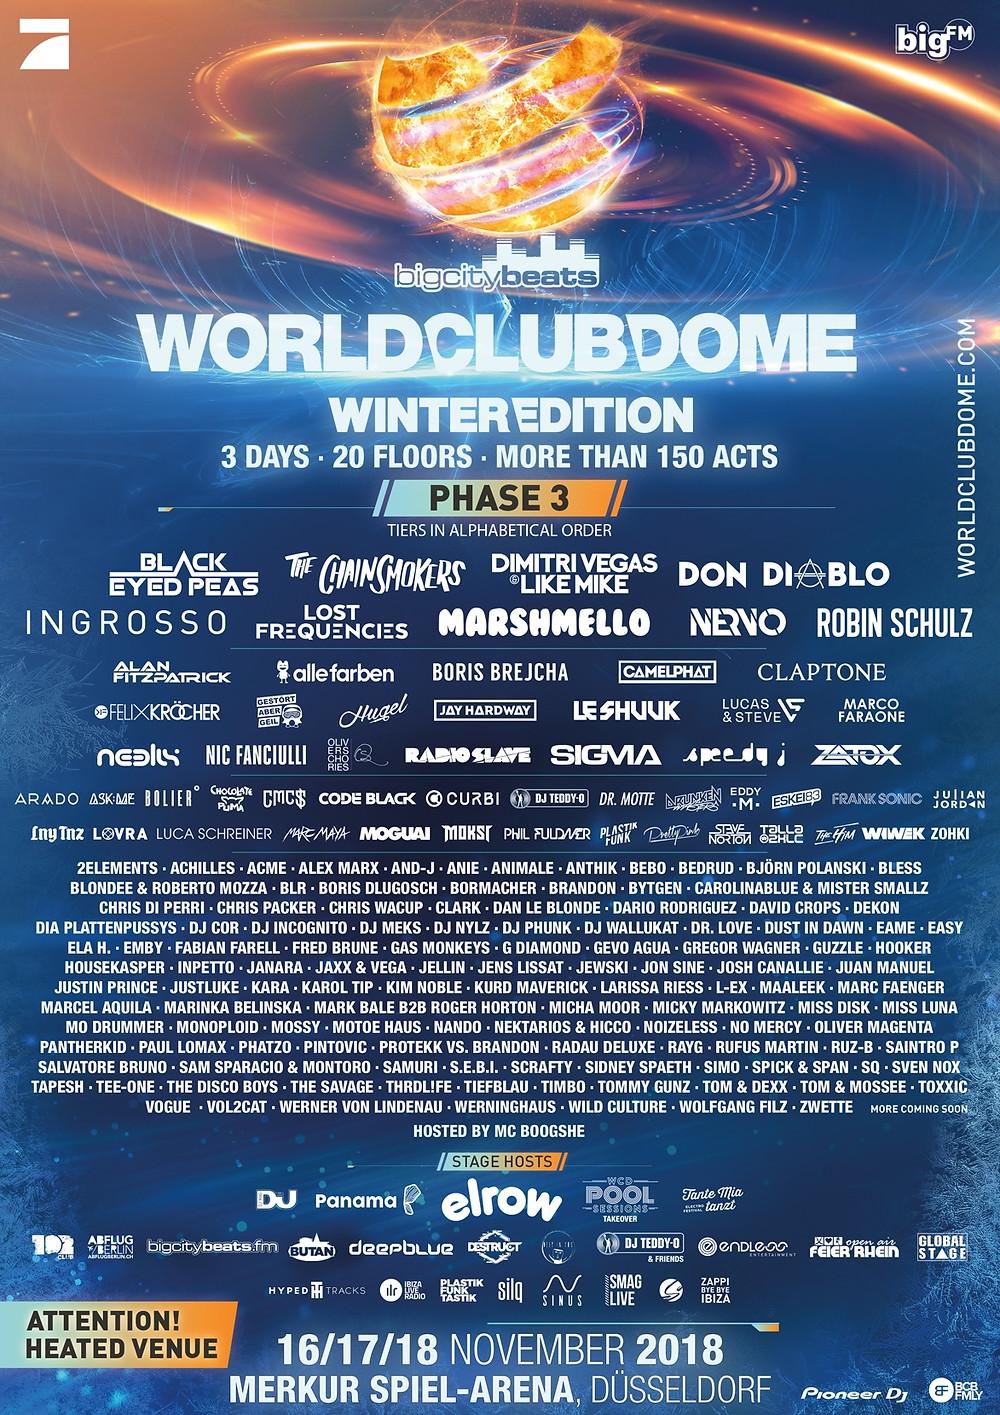 WCD Winter Edition